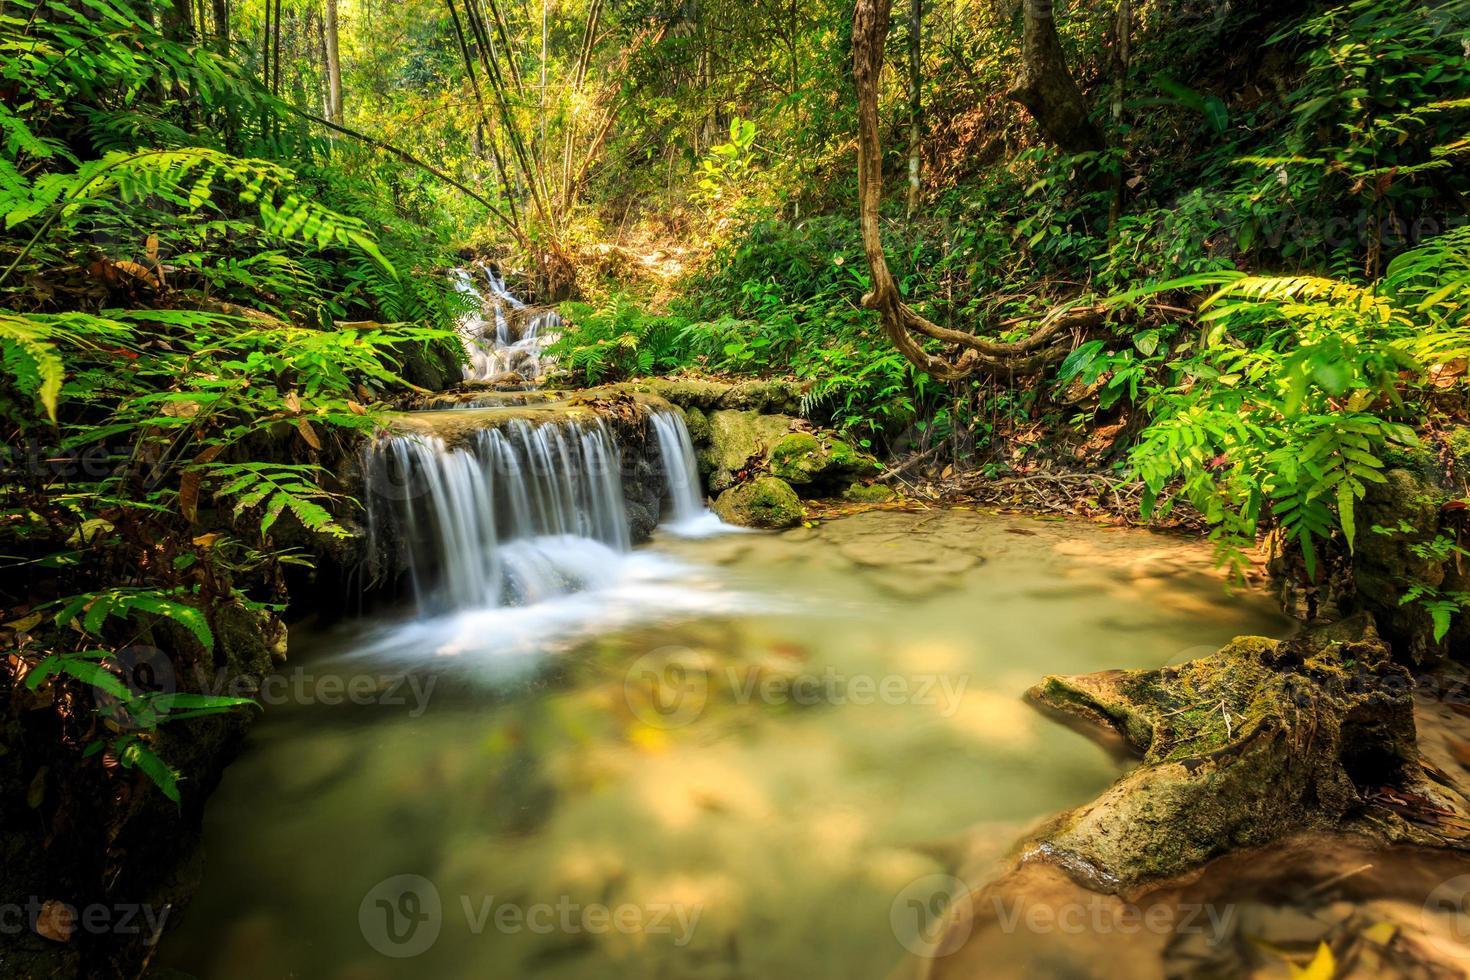 wundervoller wasserfall in thailand, pugang chiangrai foto